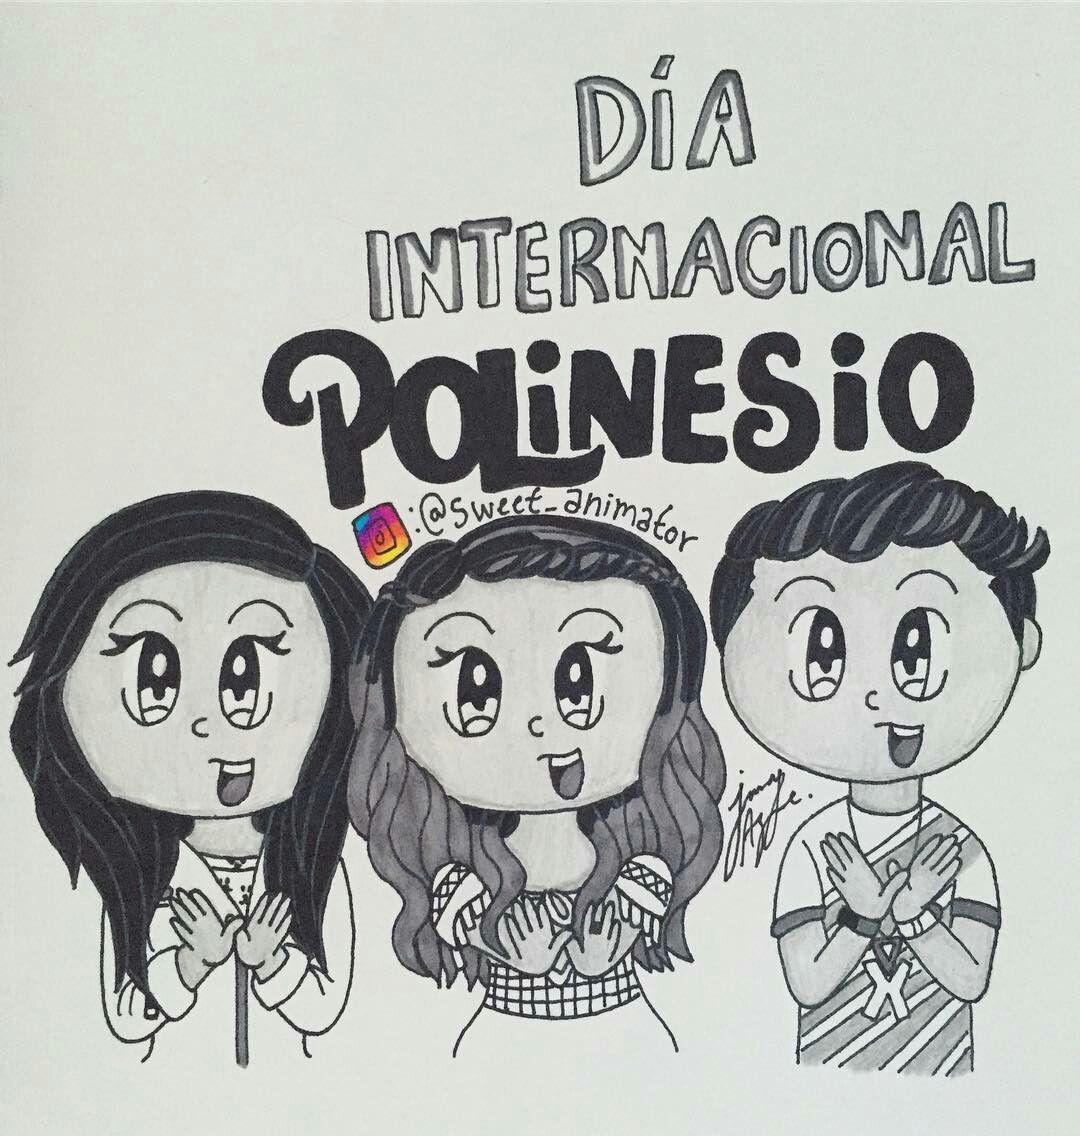 Pin De Karla Espinosa En Sweet Animator Youtubers Kawaii Y Instagram